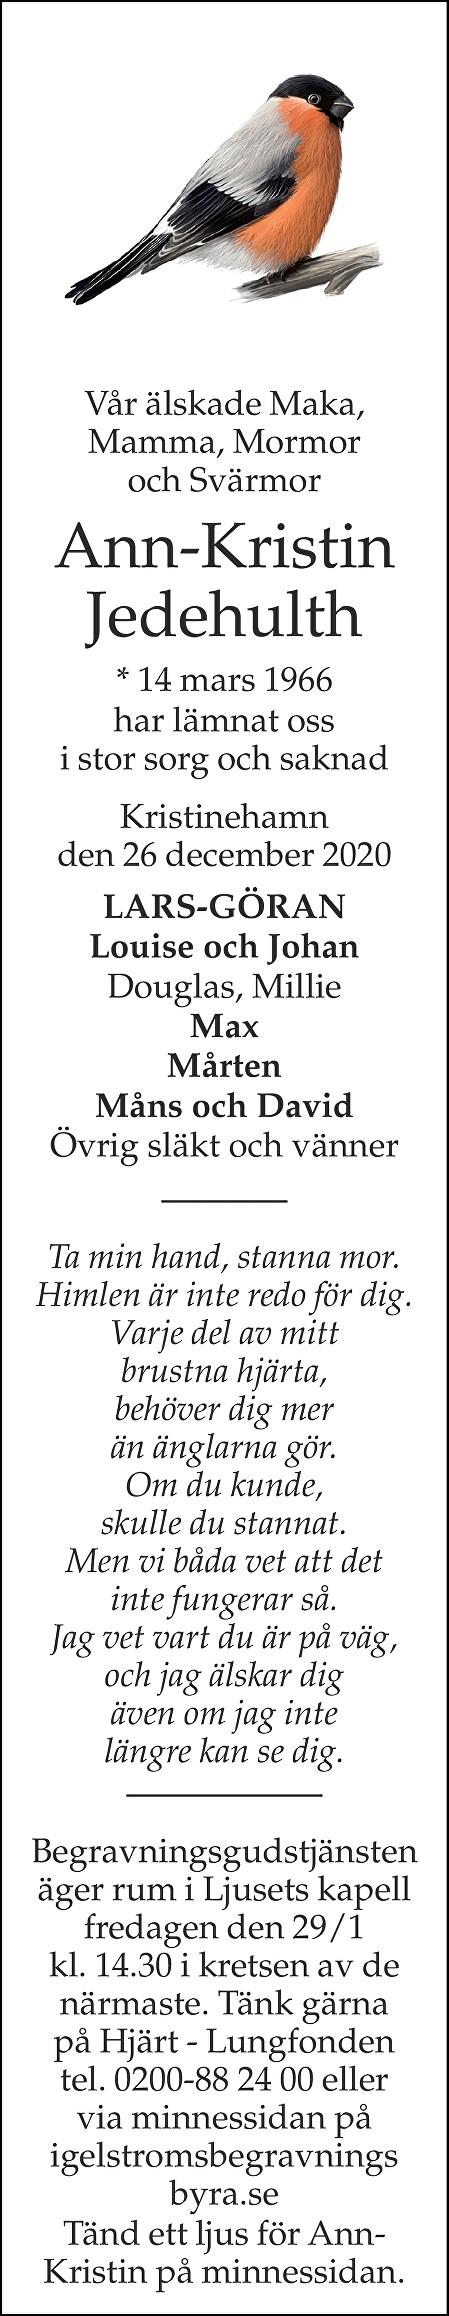 Ann-Kristin Jedehulth Death notice